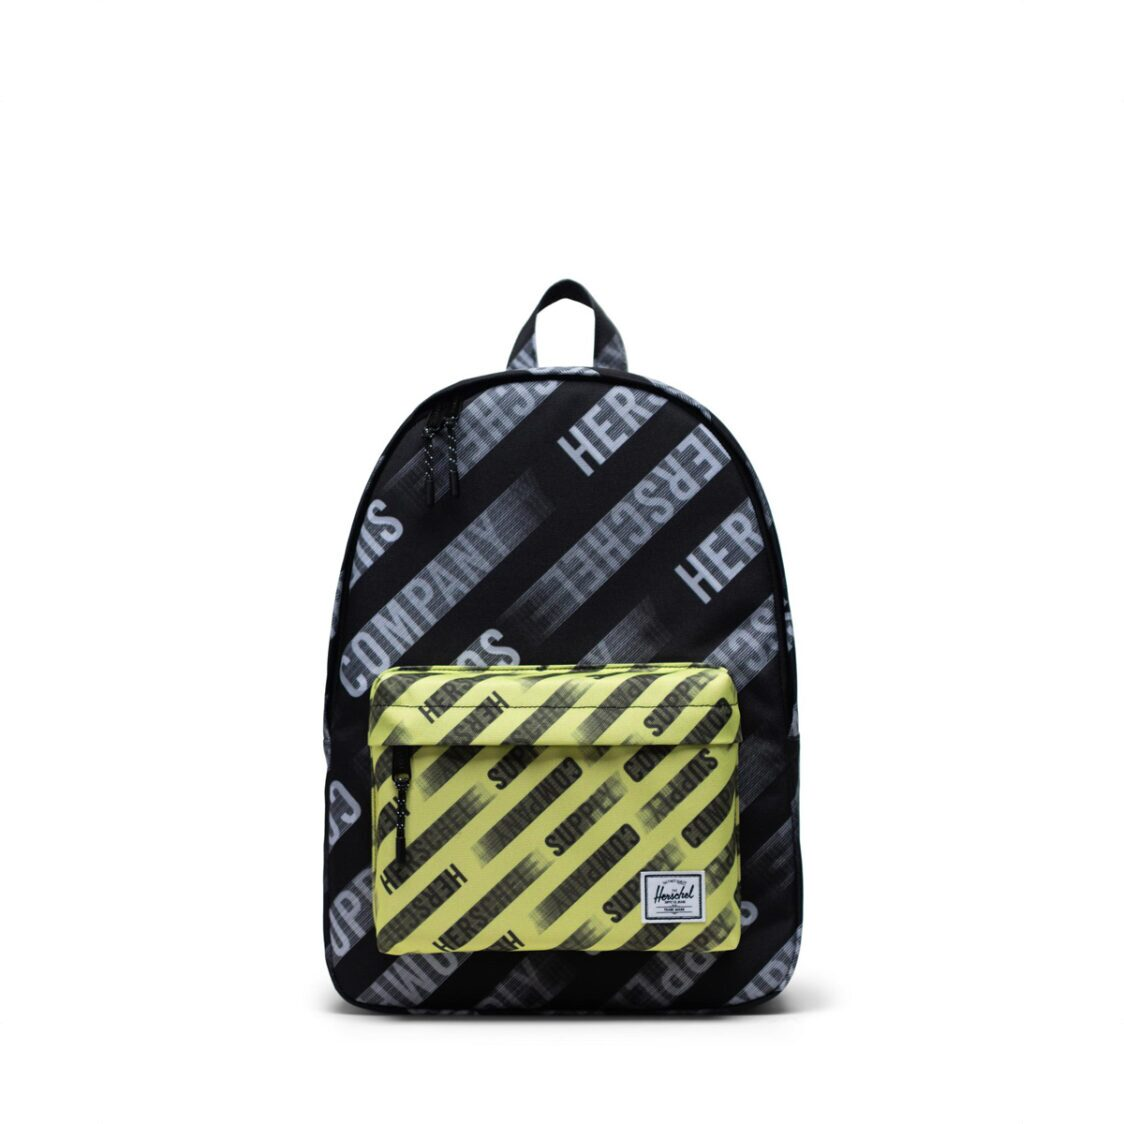 Herschel Classic - Motion BlackHighlight Backpack 10500-04485-OS